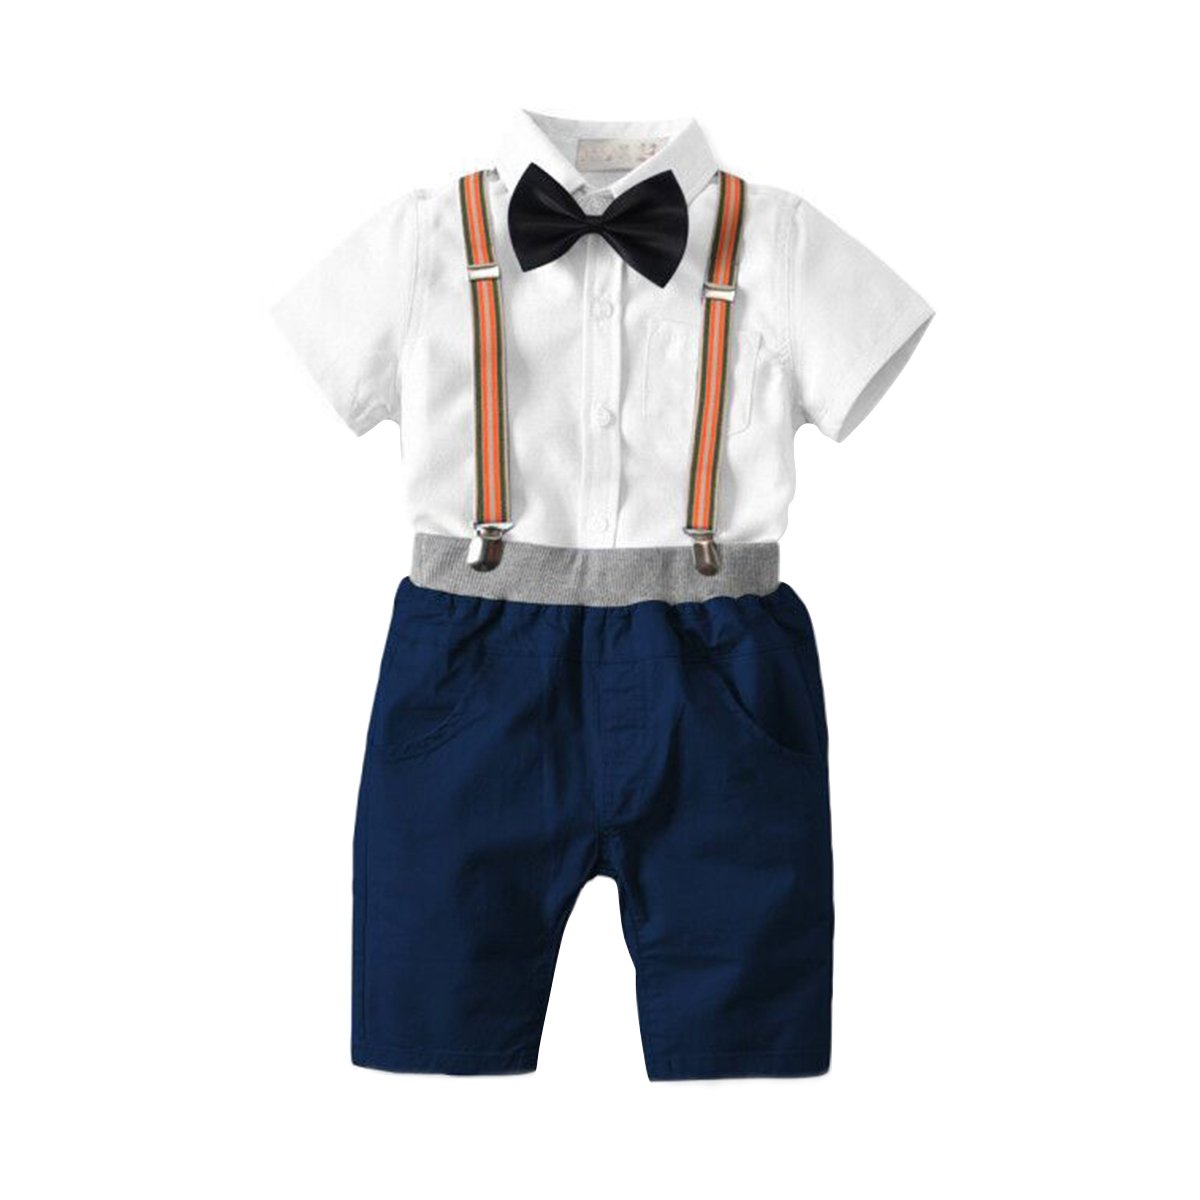 Kid Little Boy Gentleman Outfit Set Short Sleeve Shirt Bow Tie Clothing Set 18M